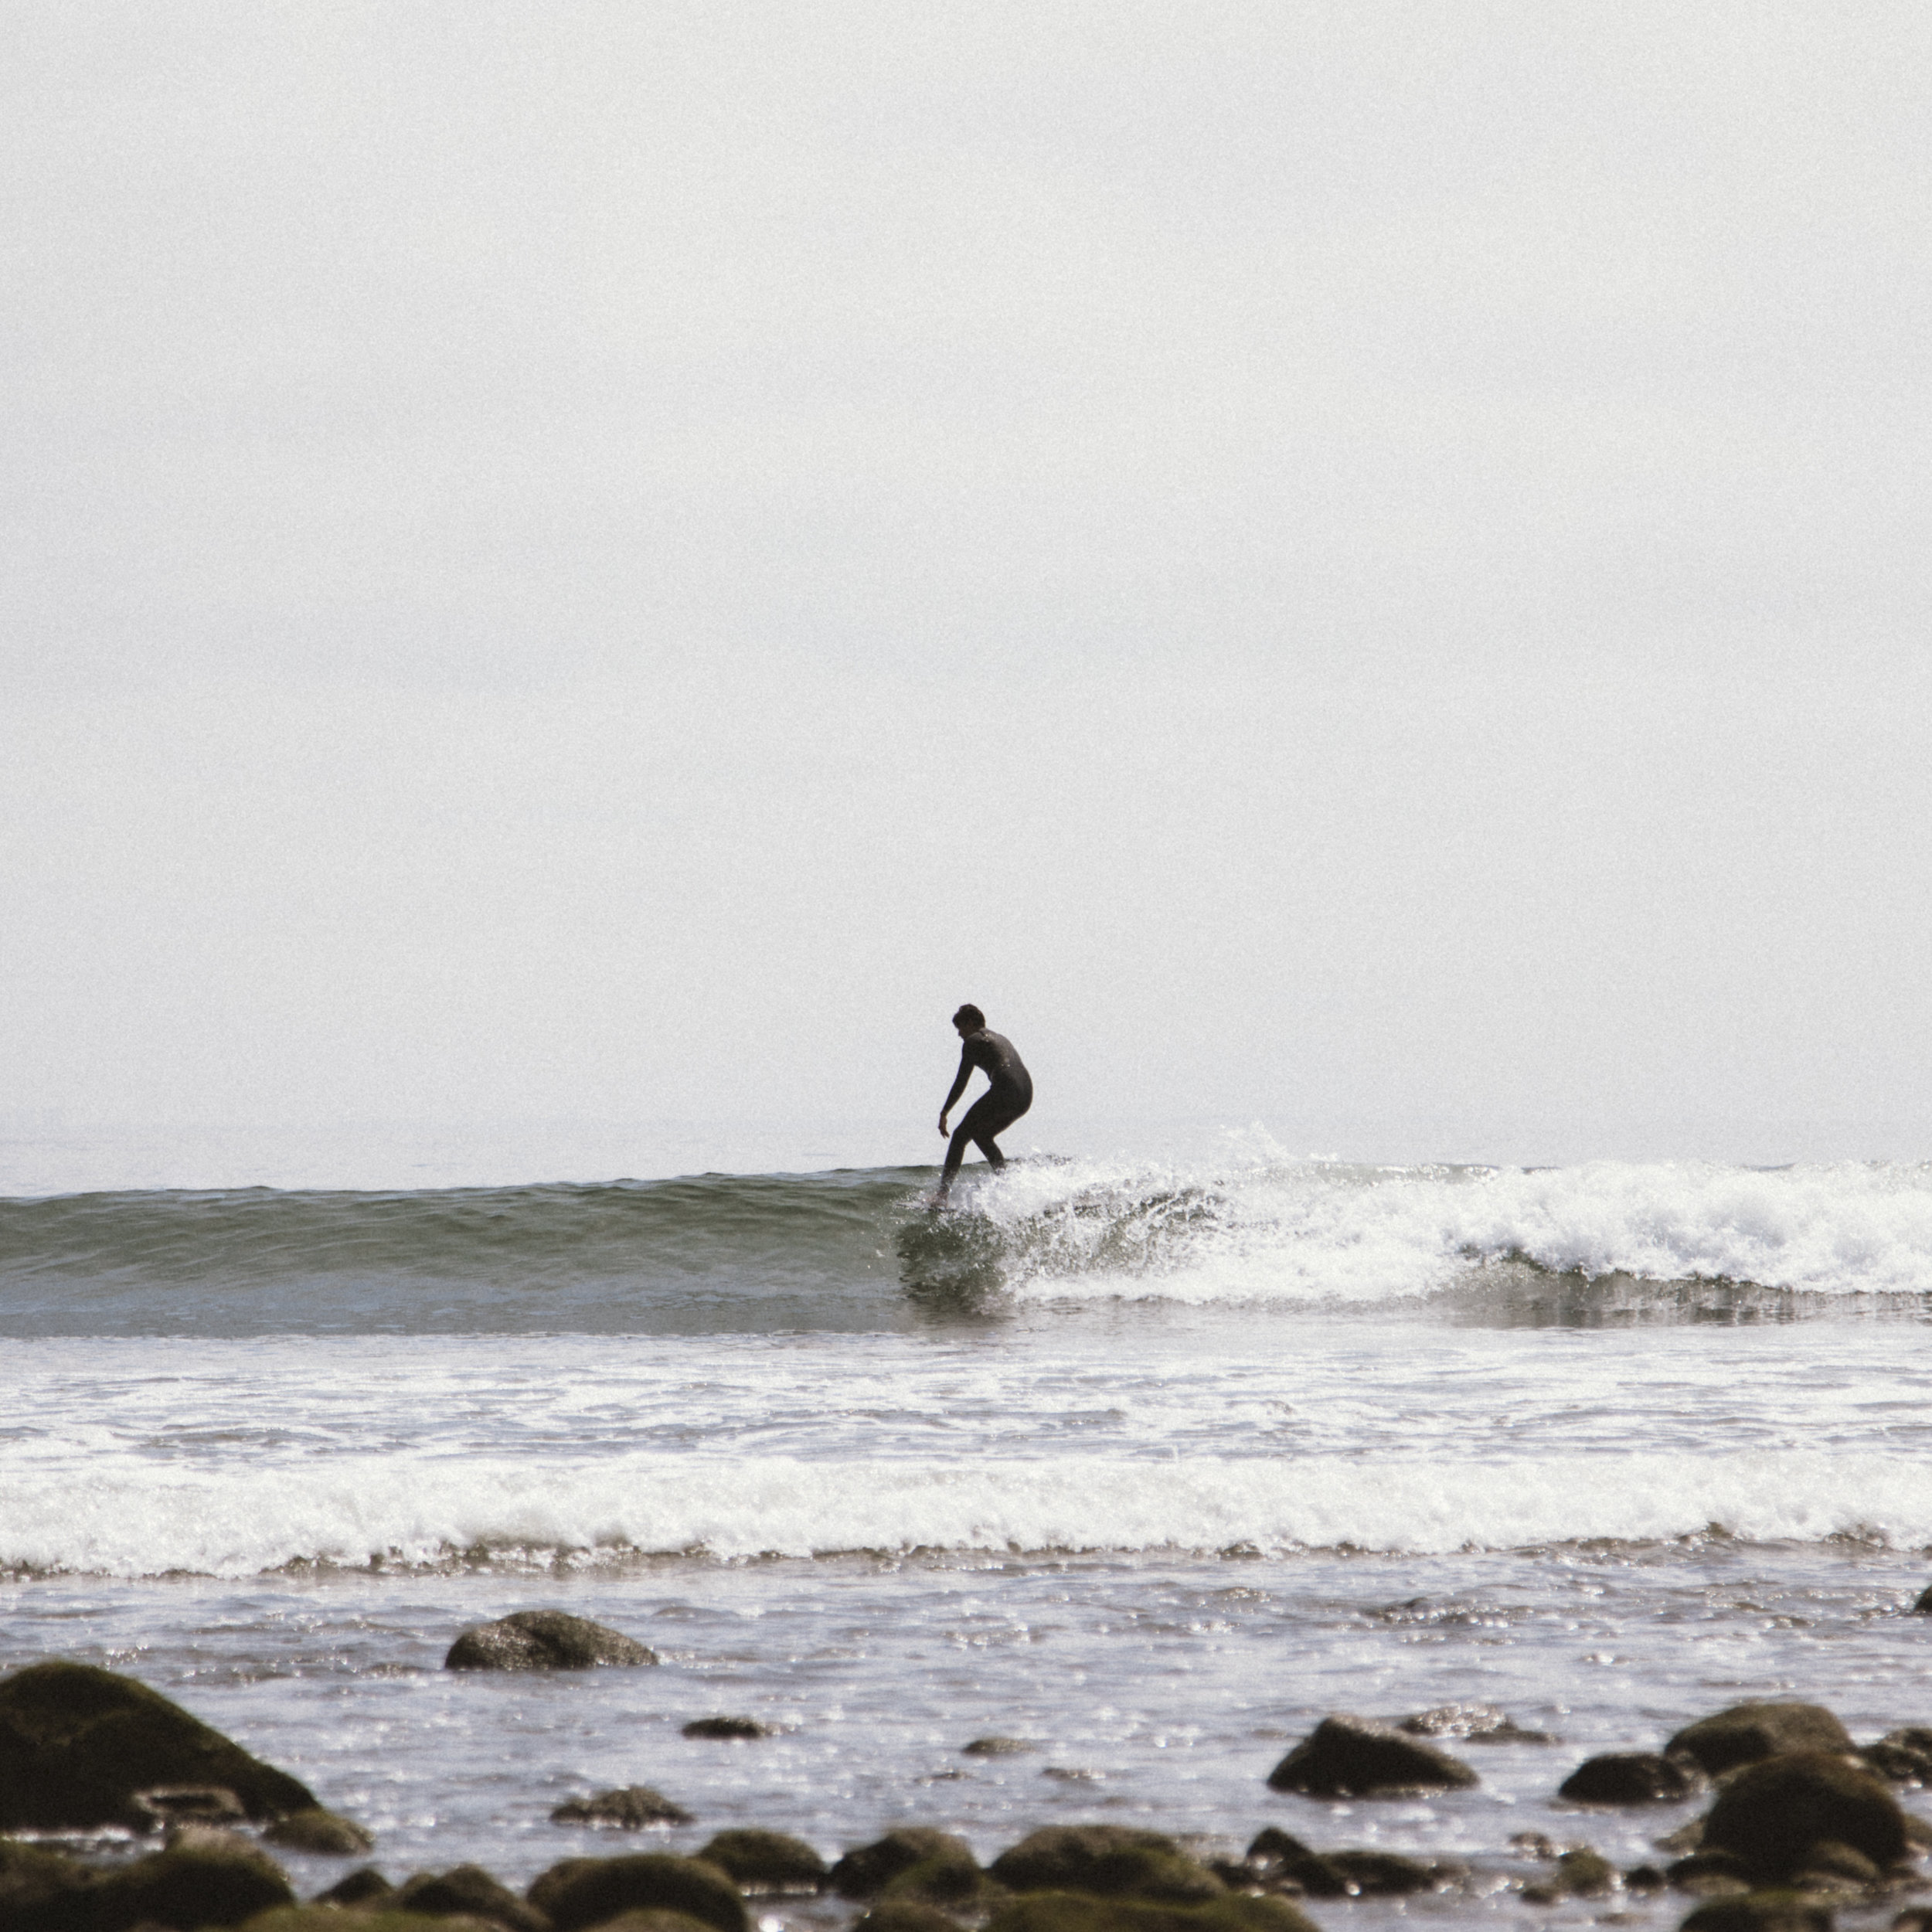 GabrielxRoamers_Surf-7.jpg